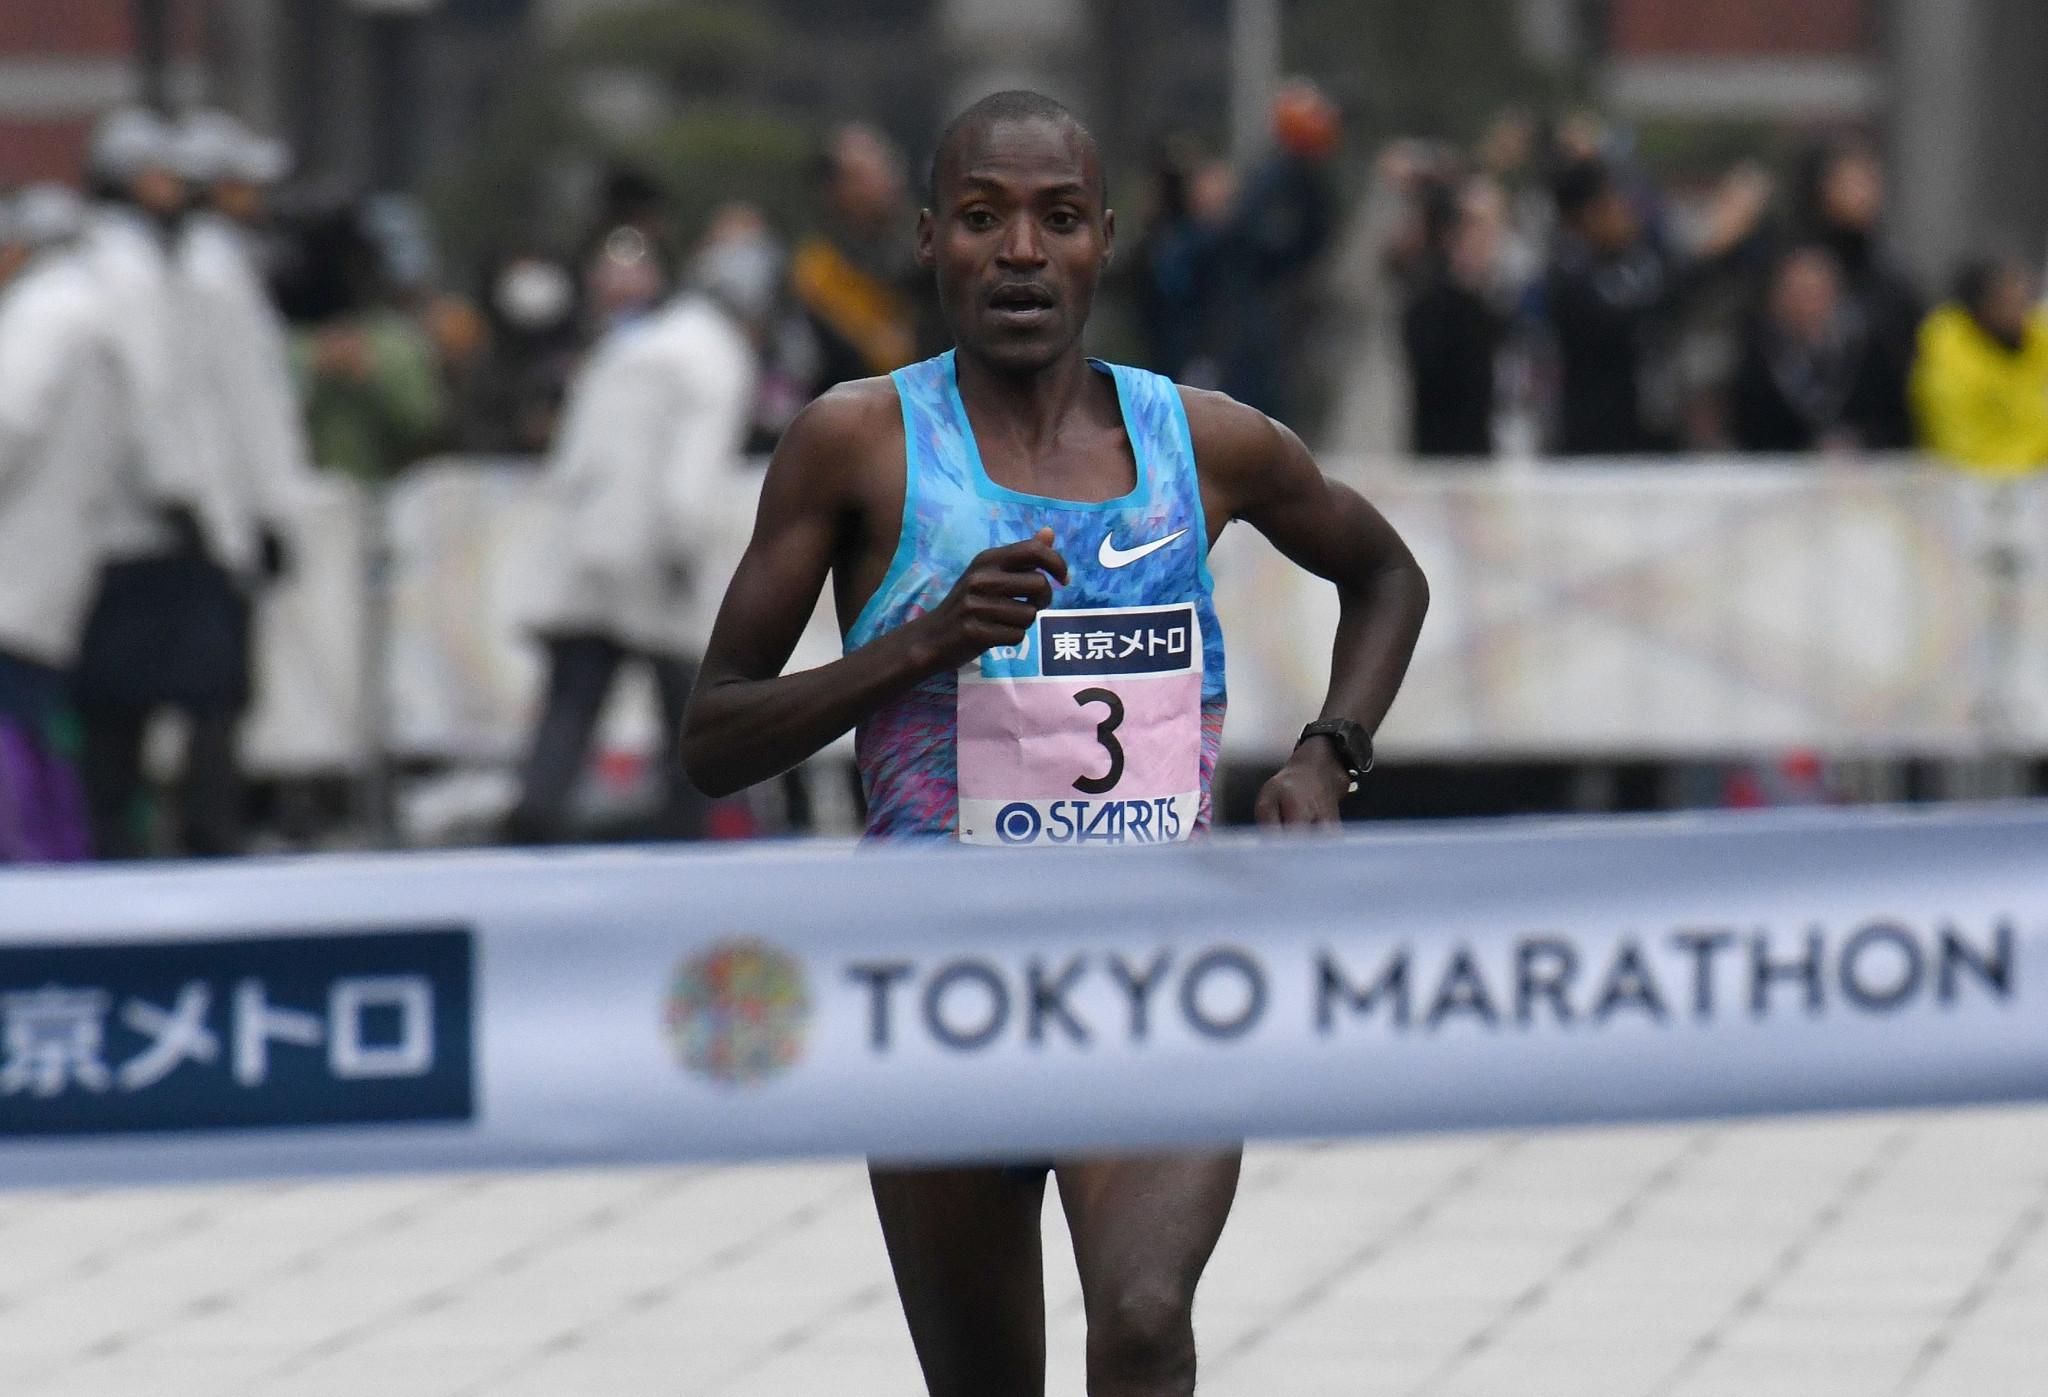 Kenyan chasing hat-trick of titles at Tokyo Marathon but Japanese charge towards 2020 Olympics set to gather momentum